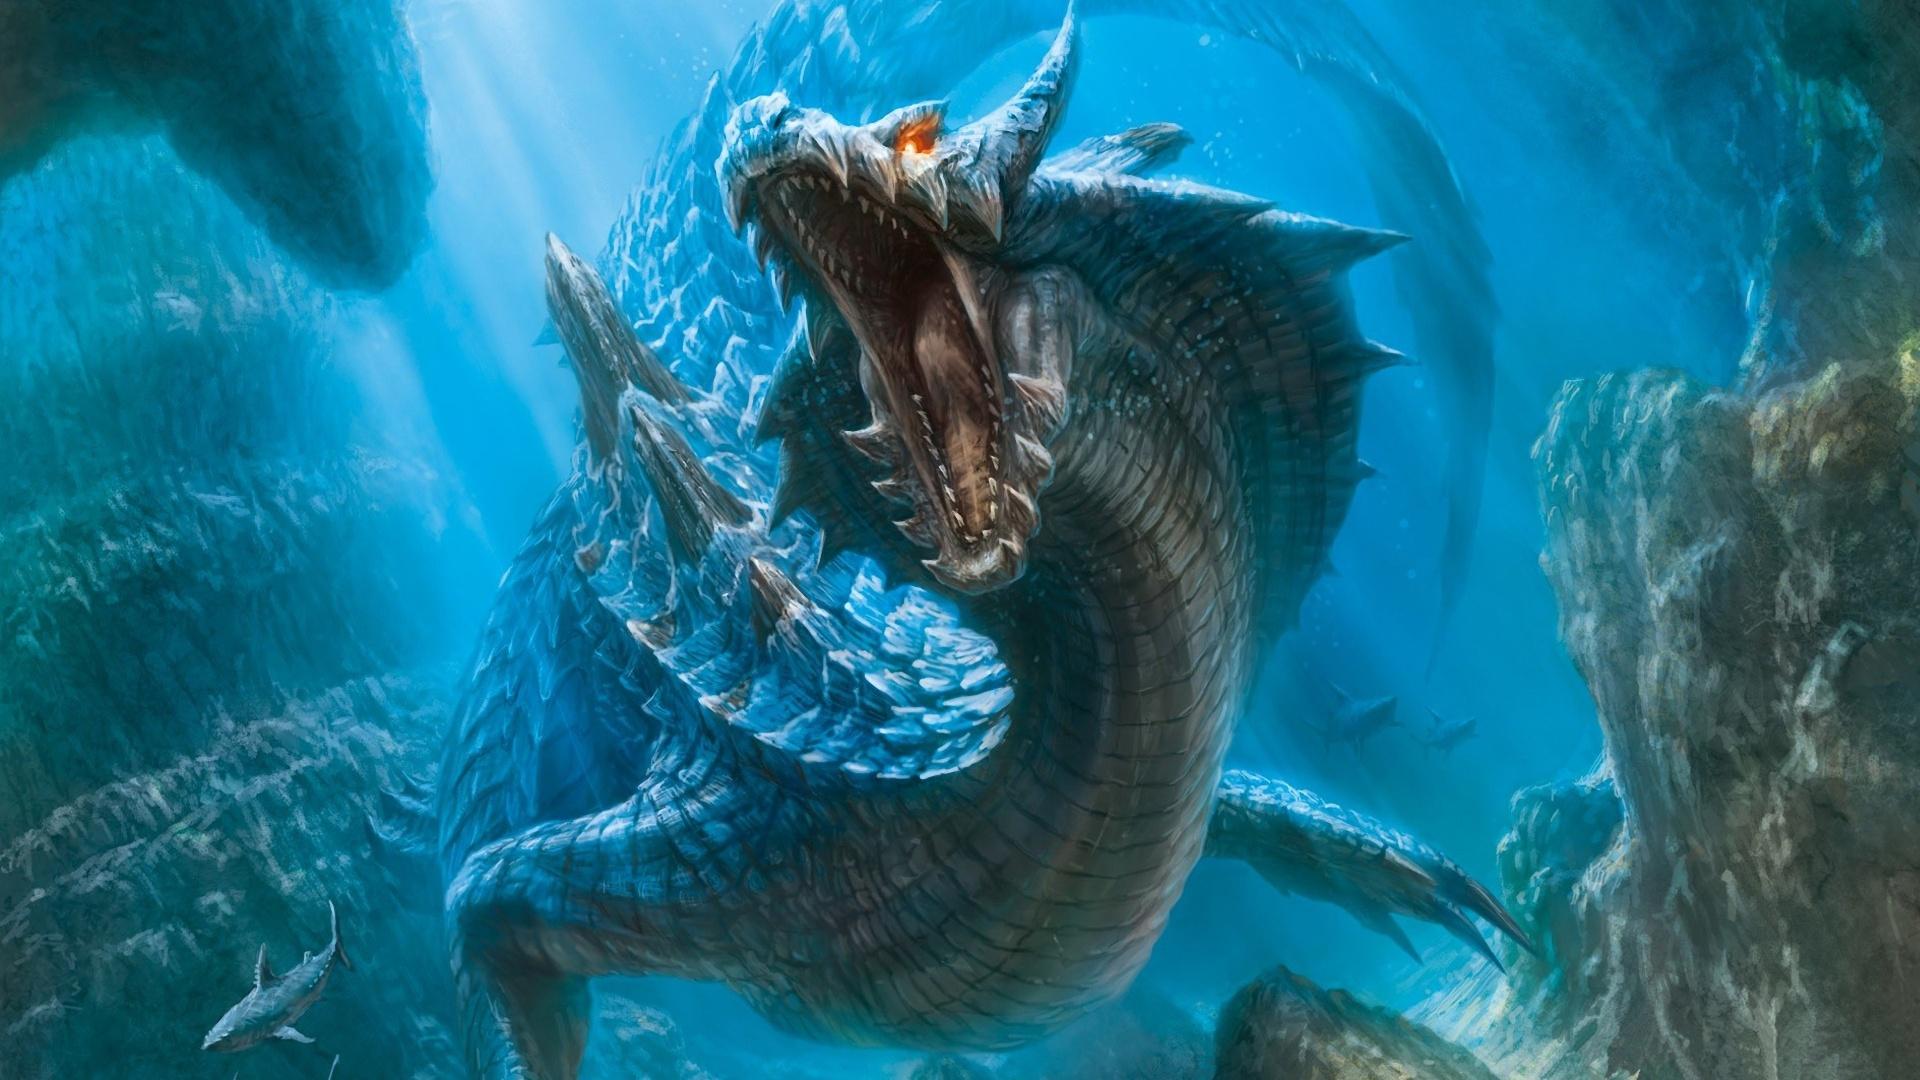 World wallpaper 1920x1080 description dragon in the underwater world